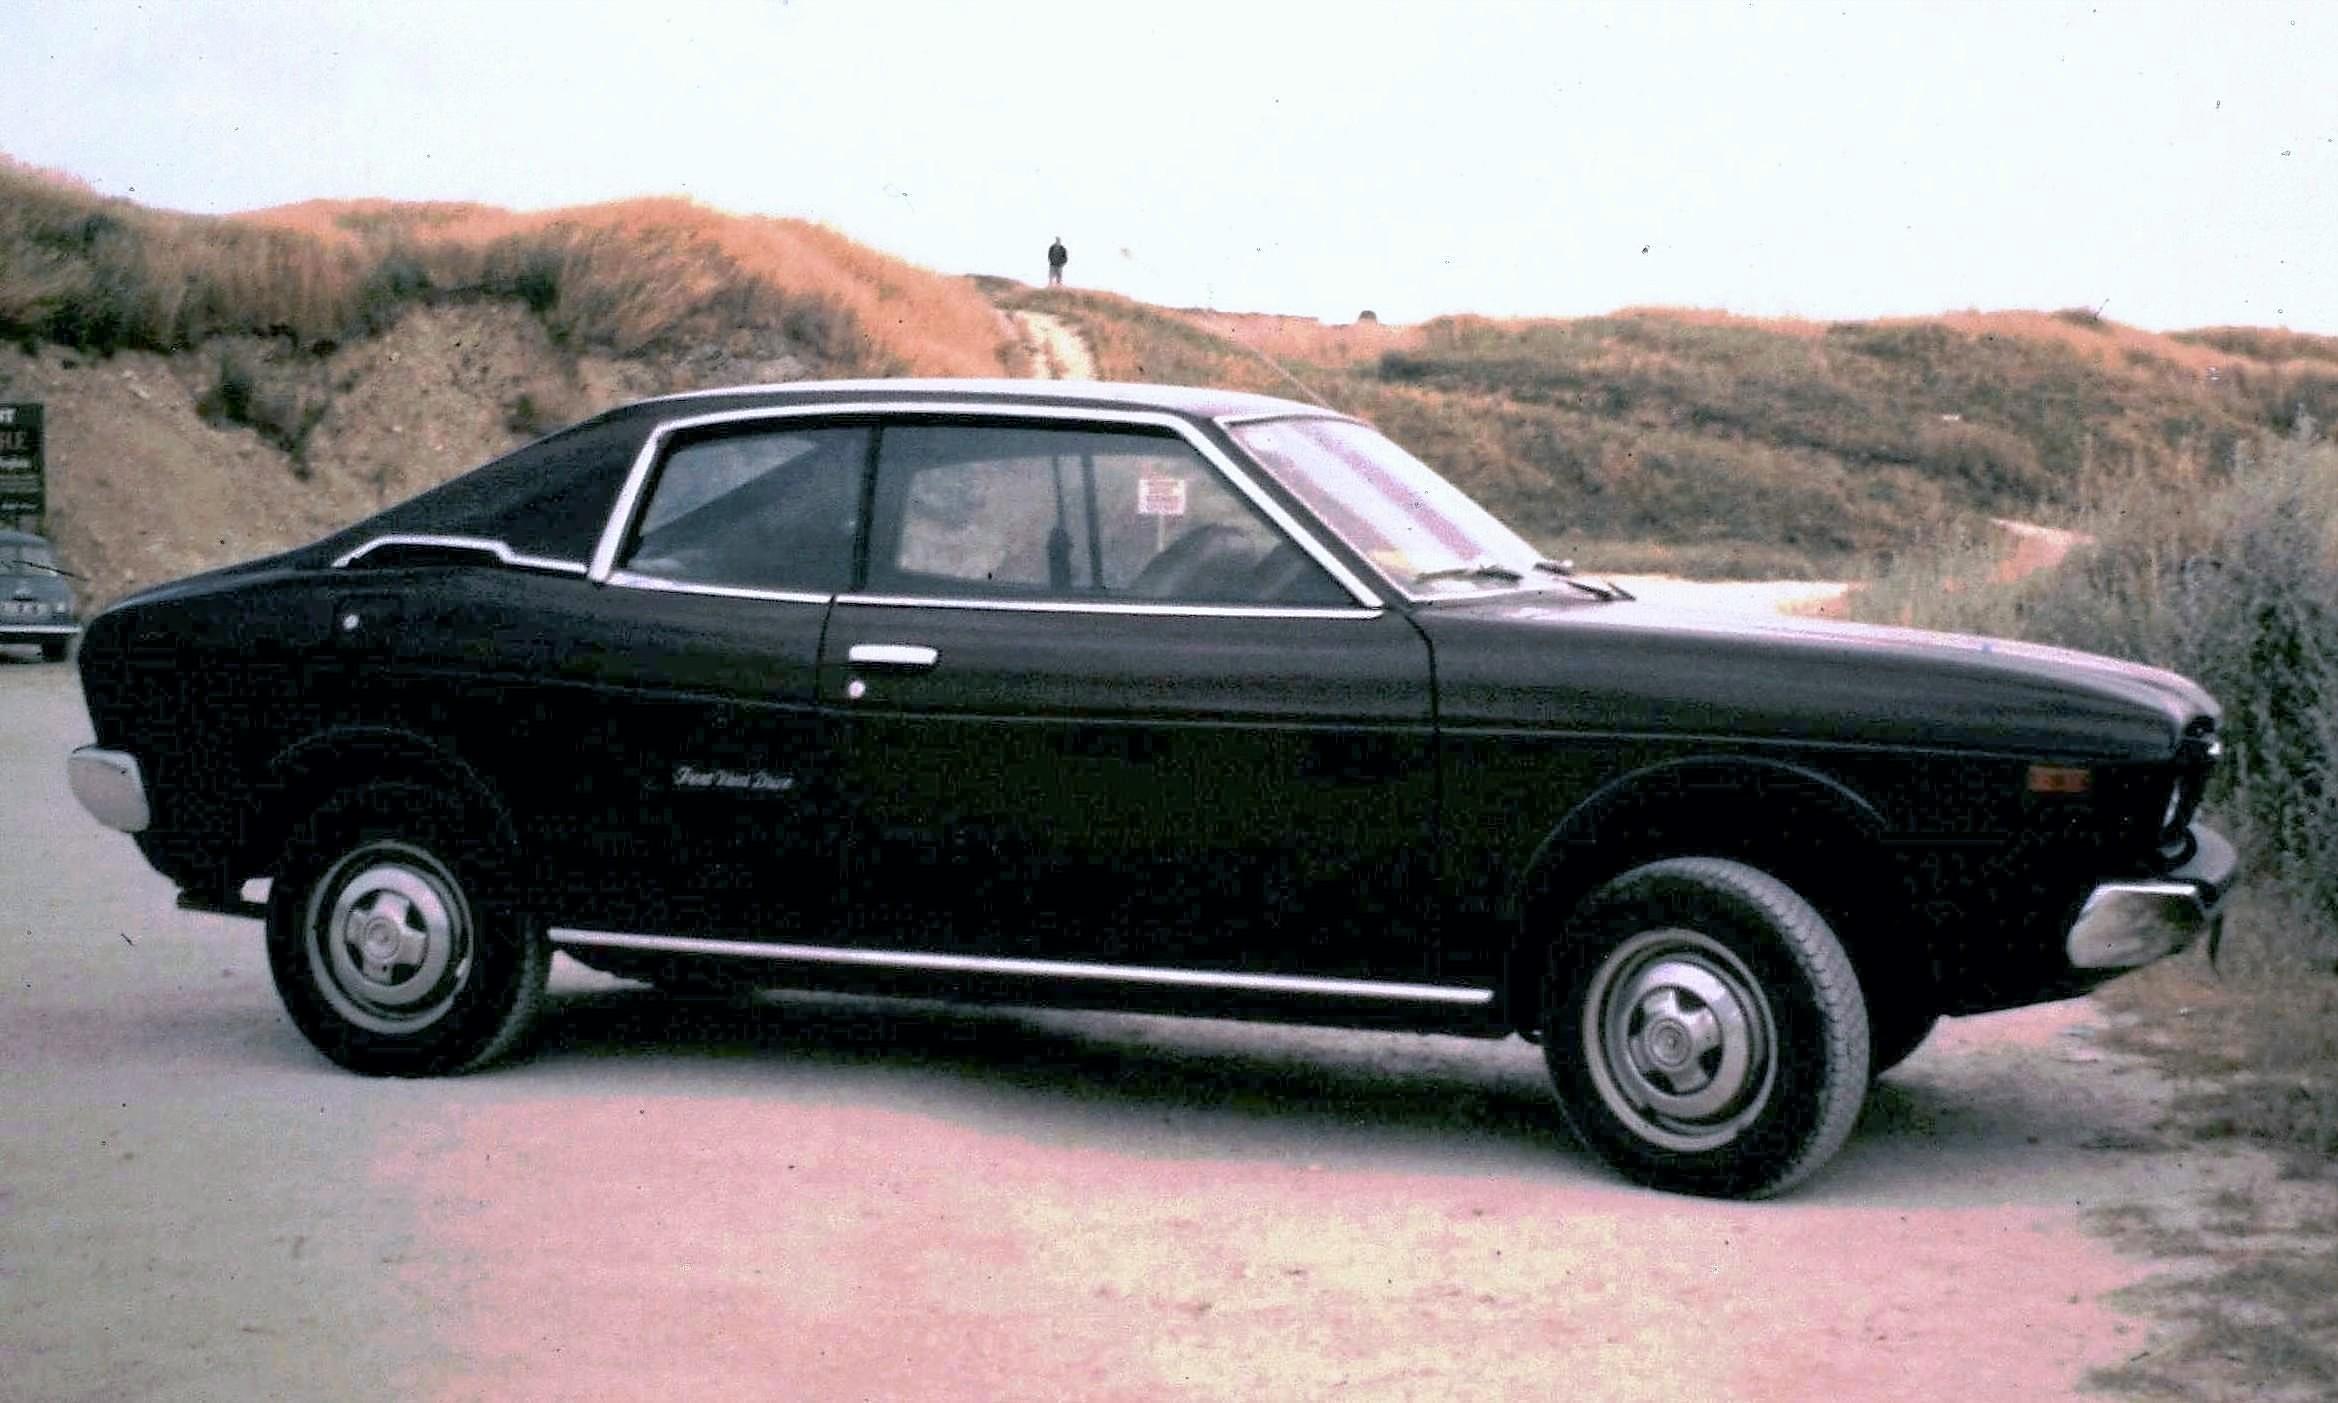 File:Subaru Hardtop in dunes 1979.jpg - Wikimedia Commons